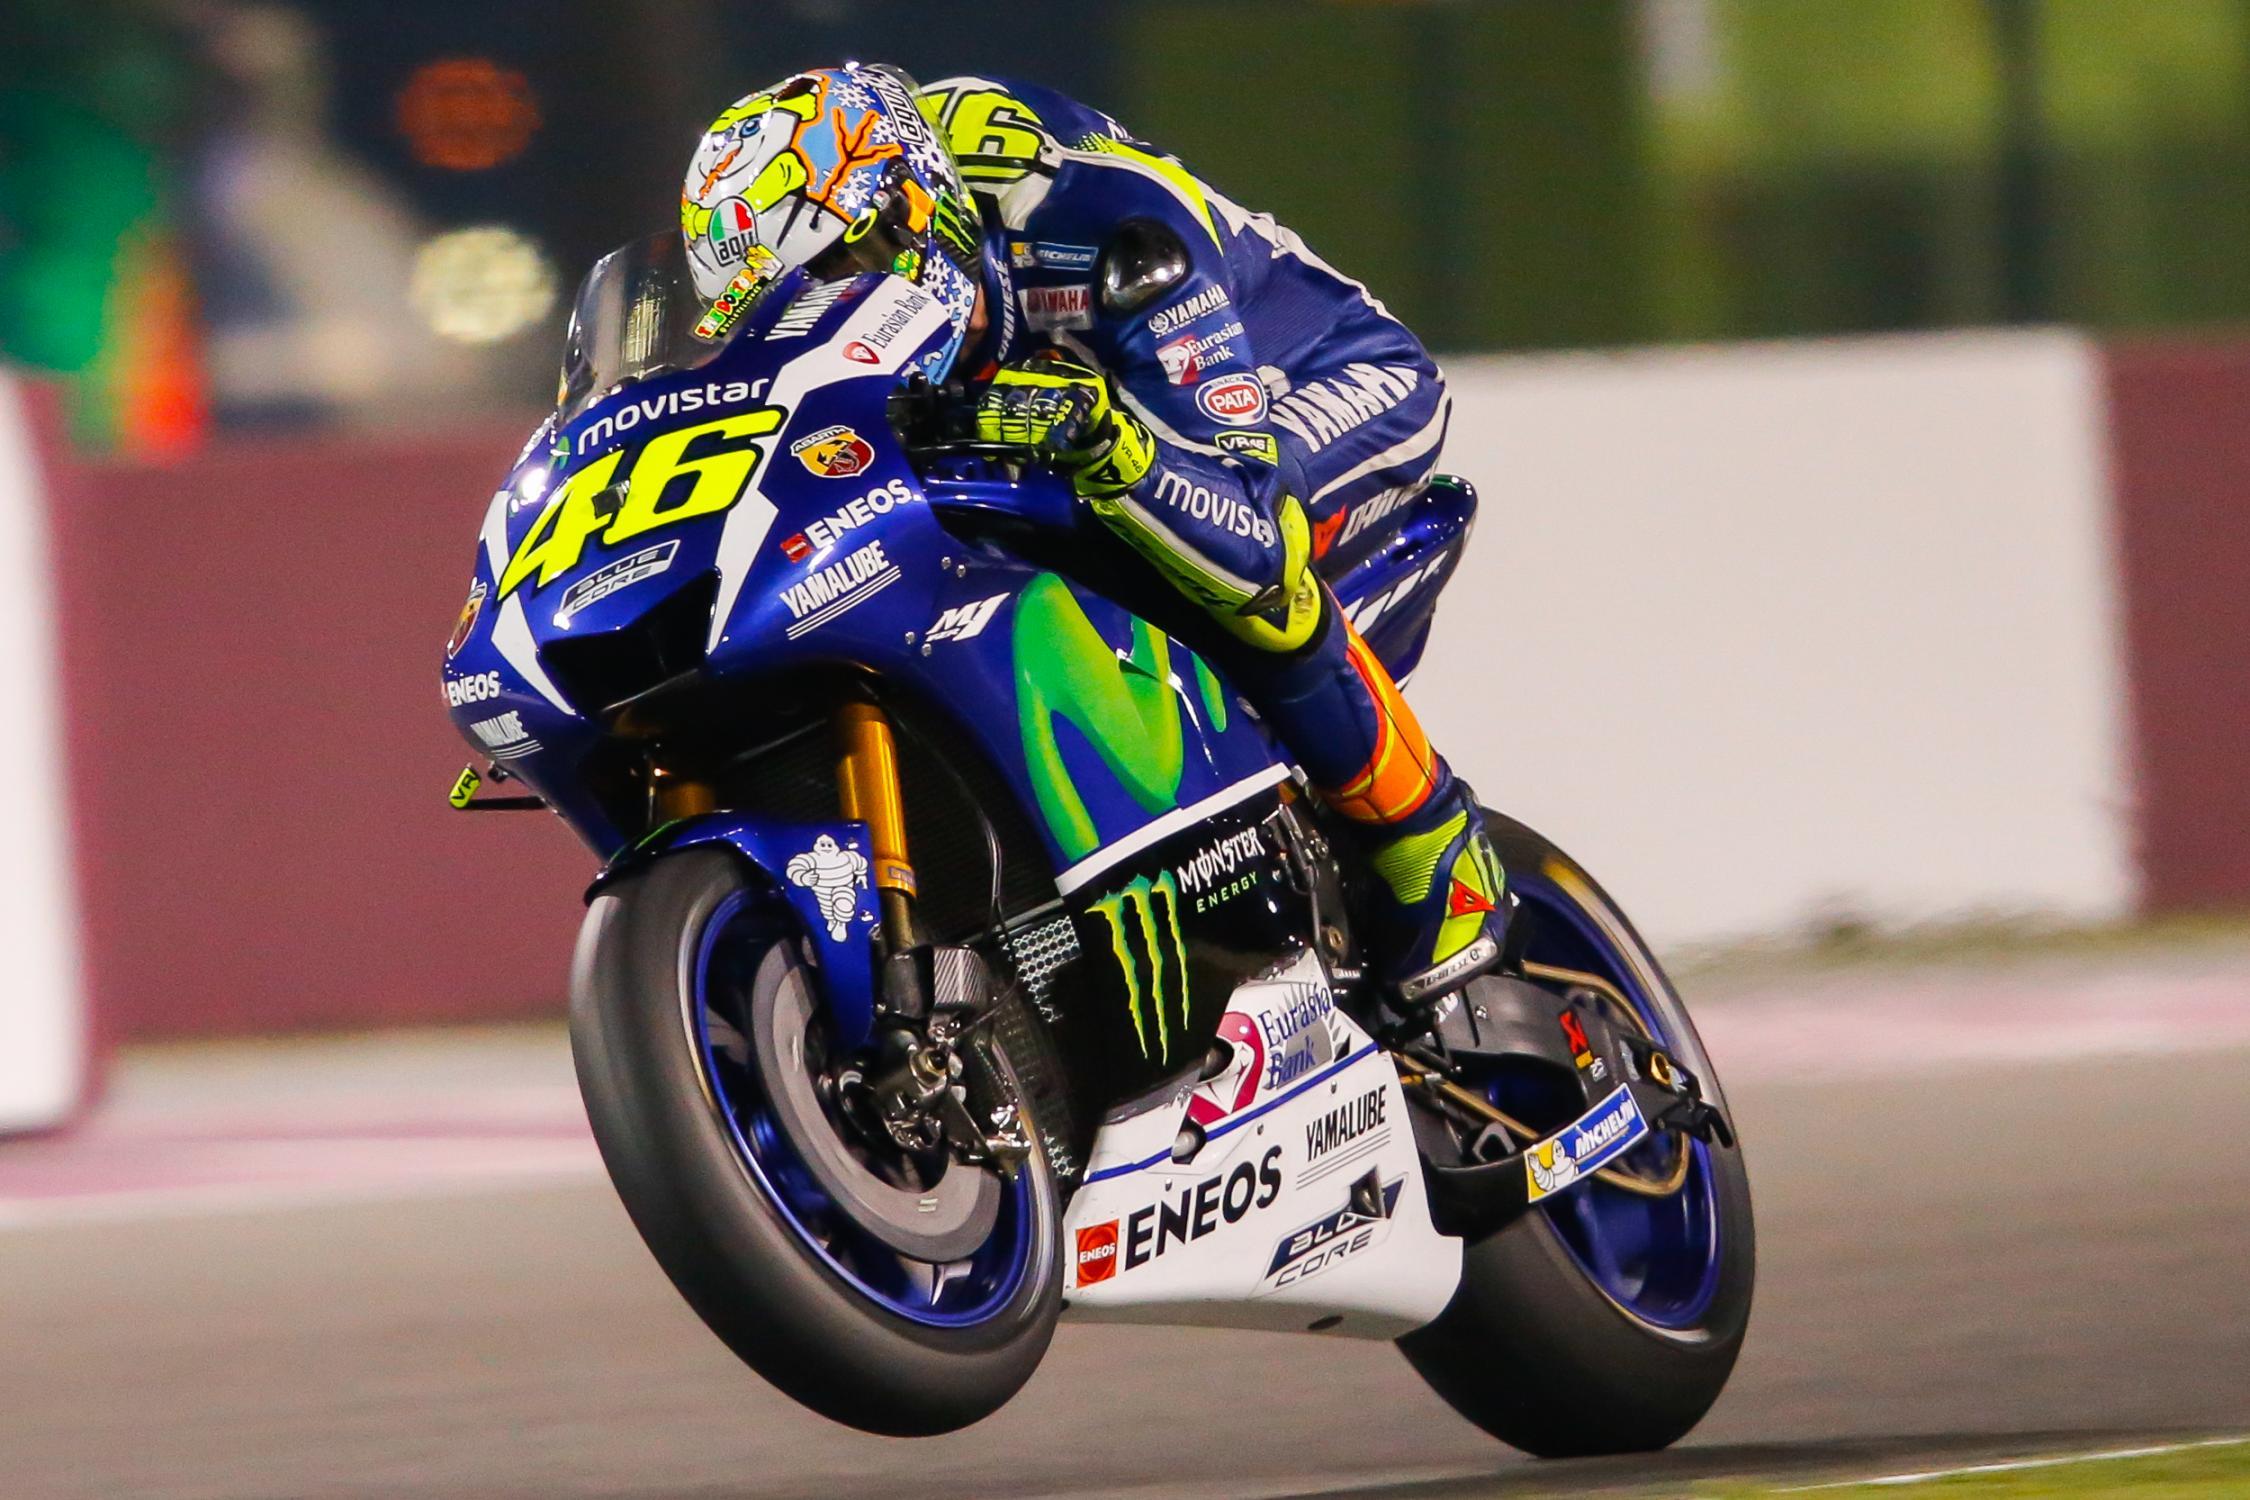 Test MotoGP Qatar 2016 46-rossi_gp_7937.gallery_full_top_fullscreen